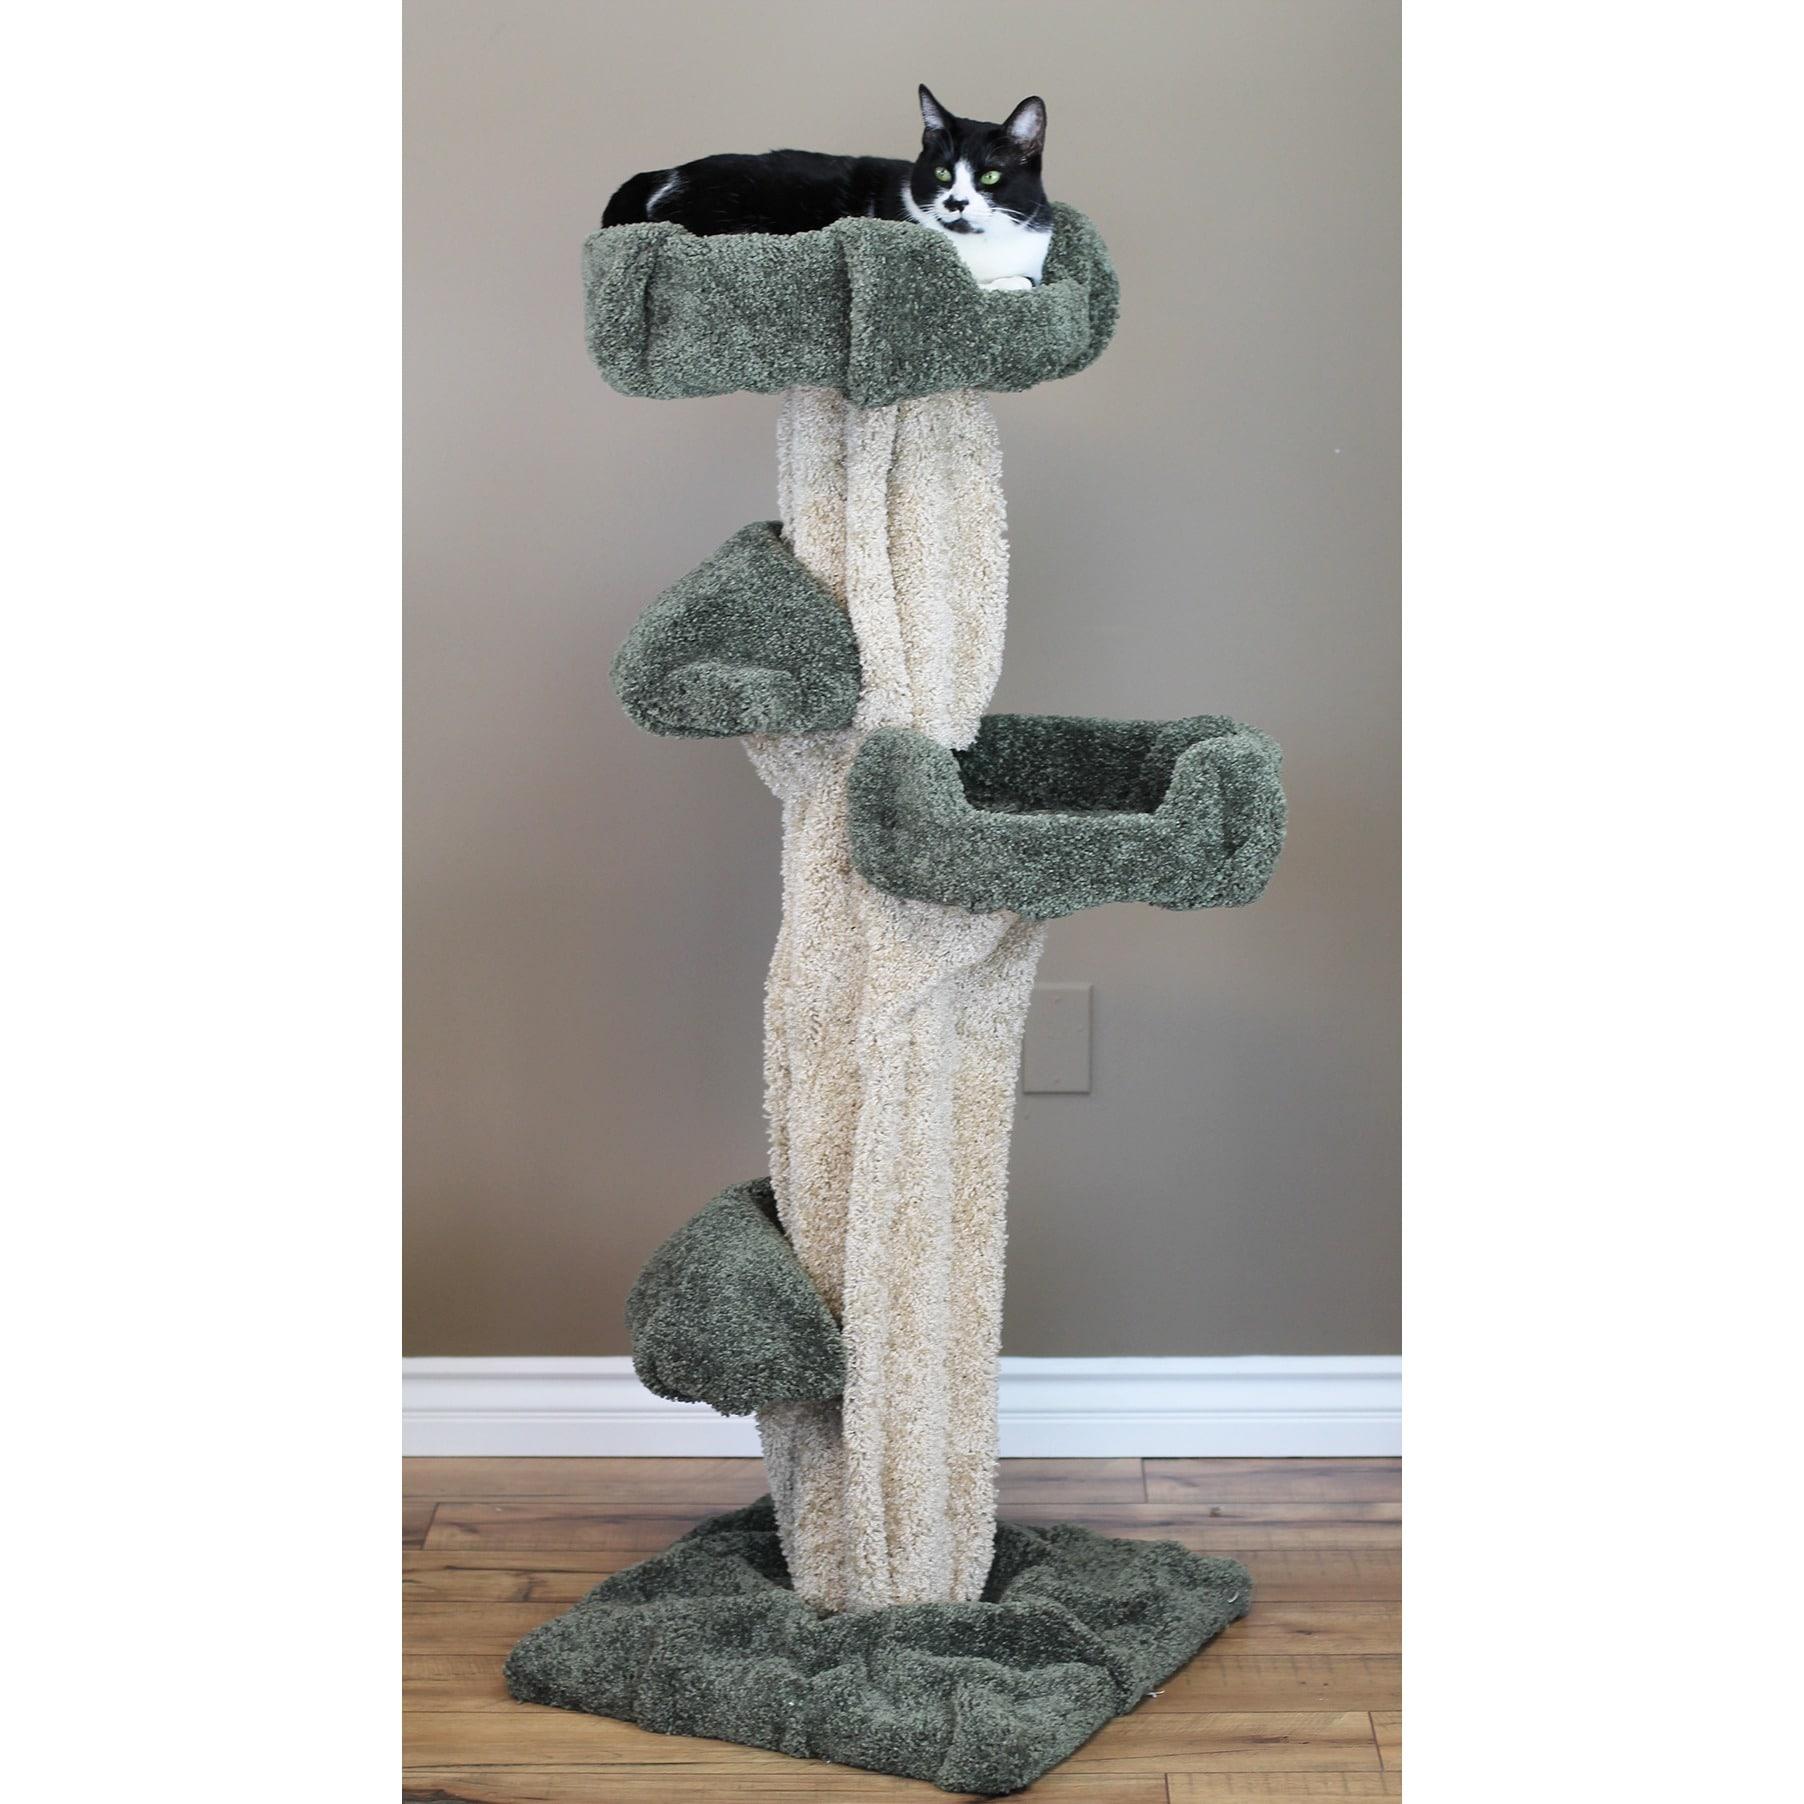 new cat condos large play cat tree  free shipping today  - new cat condos large play cat tree  free shipping today  overstockcom